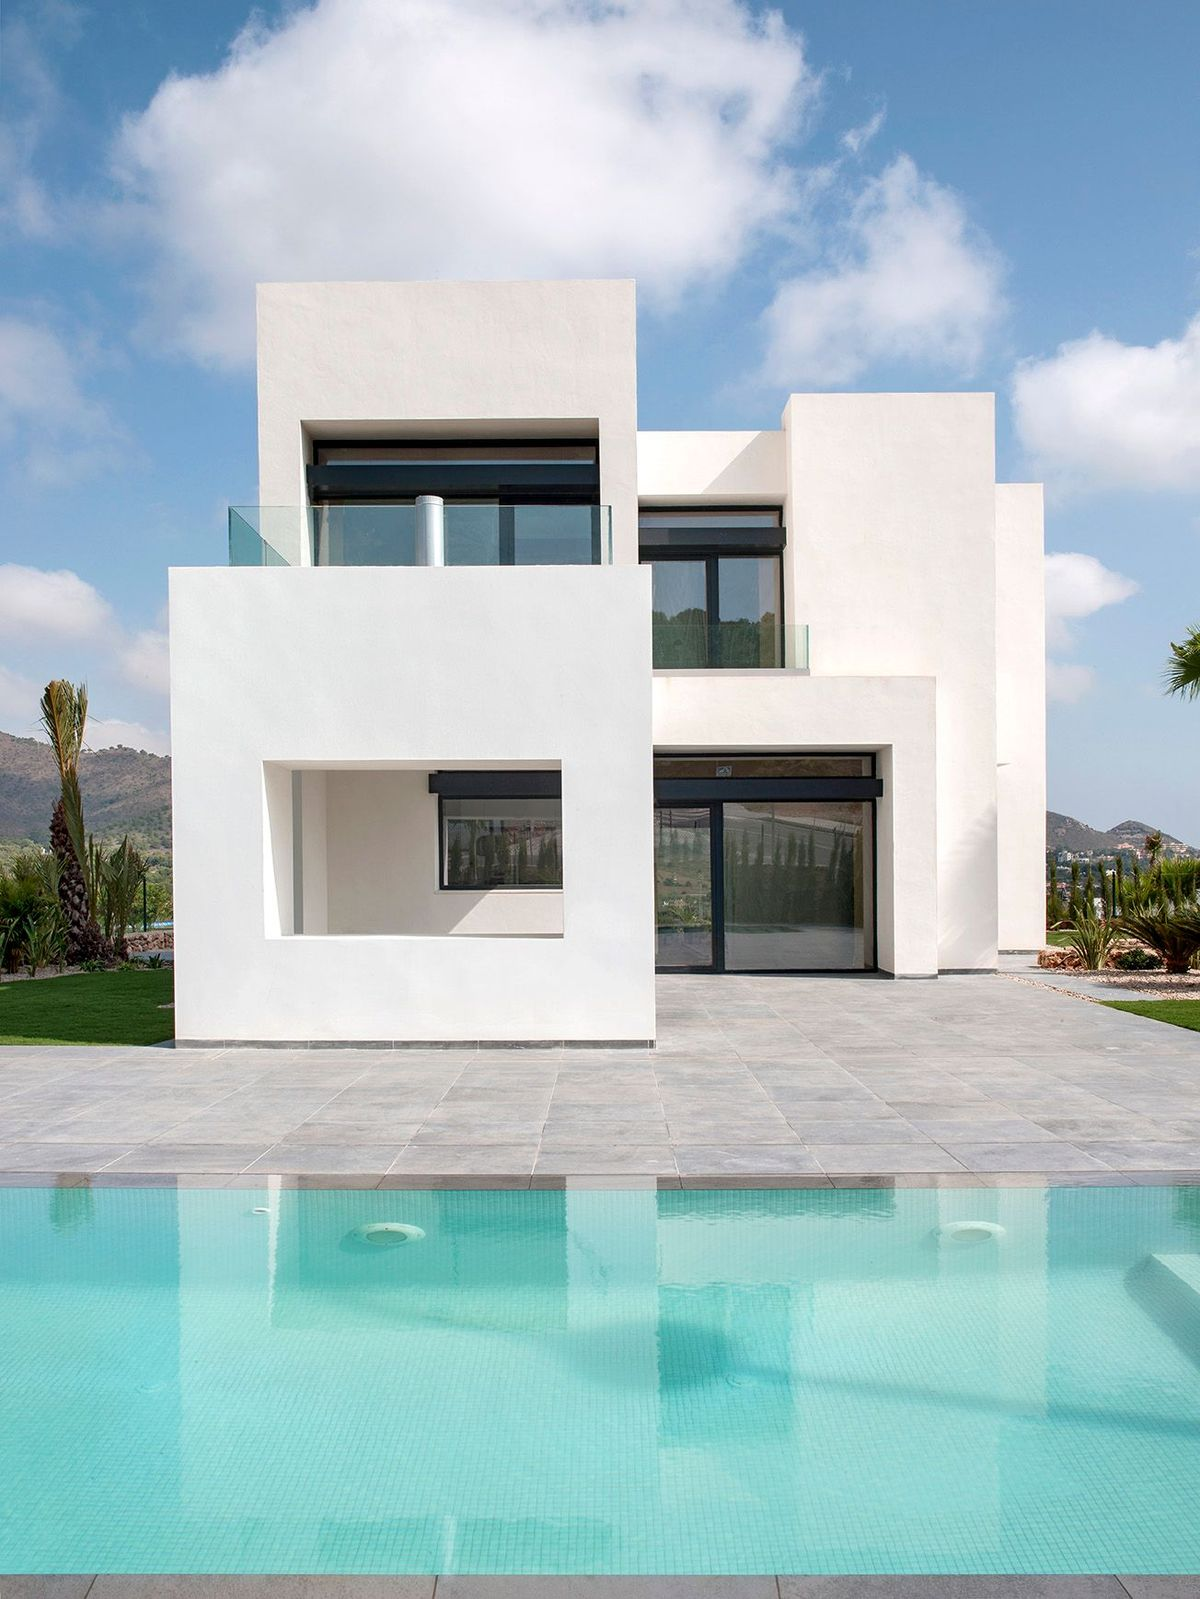 New 4 bedroom villa with private pool in La Manga Resort Club – Murcia (Spain)